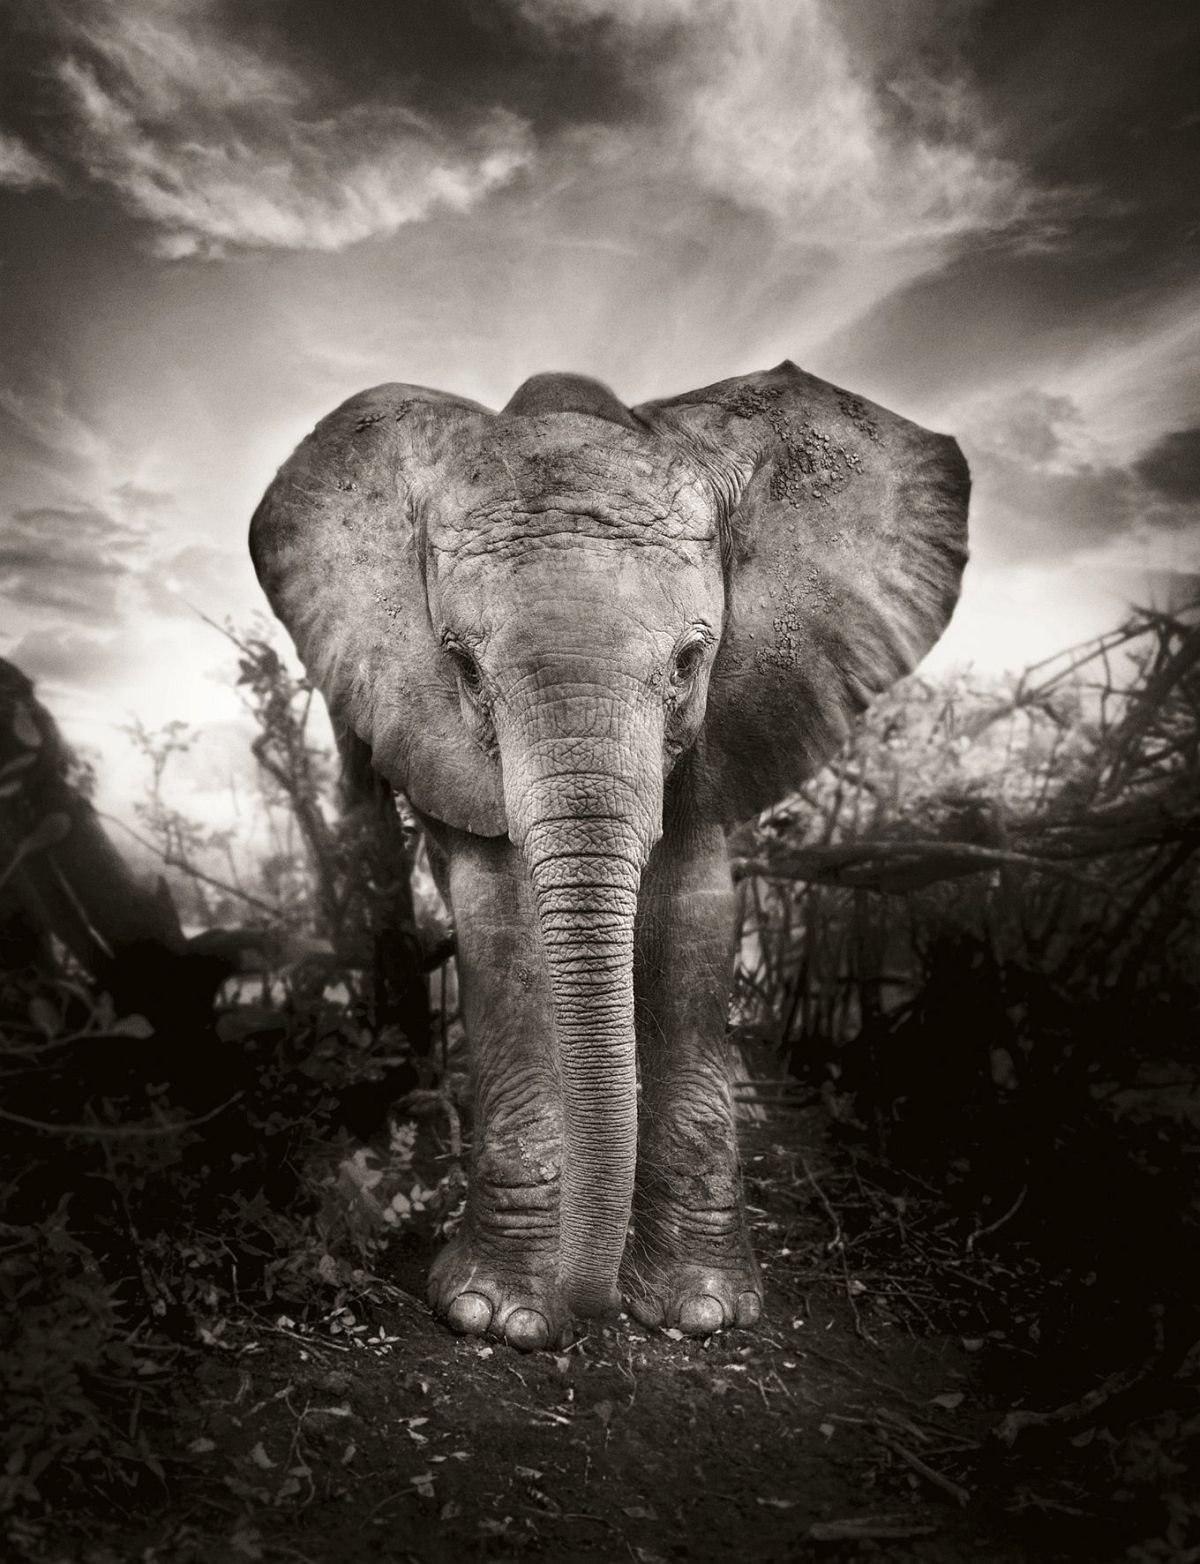 © Elephants in Heaven by Joachim Schmeisser, published by teNeues, www.teneues.com, Portrait of KIBO, one year old, Nairobi National Park 2009, Photo © 2017 Joachim Schmeisser